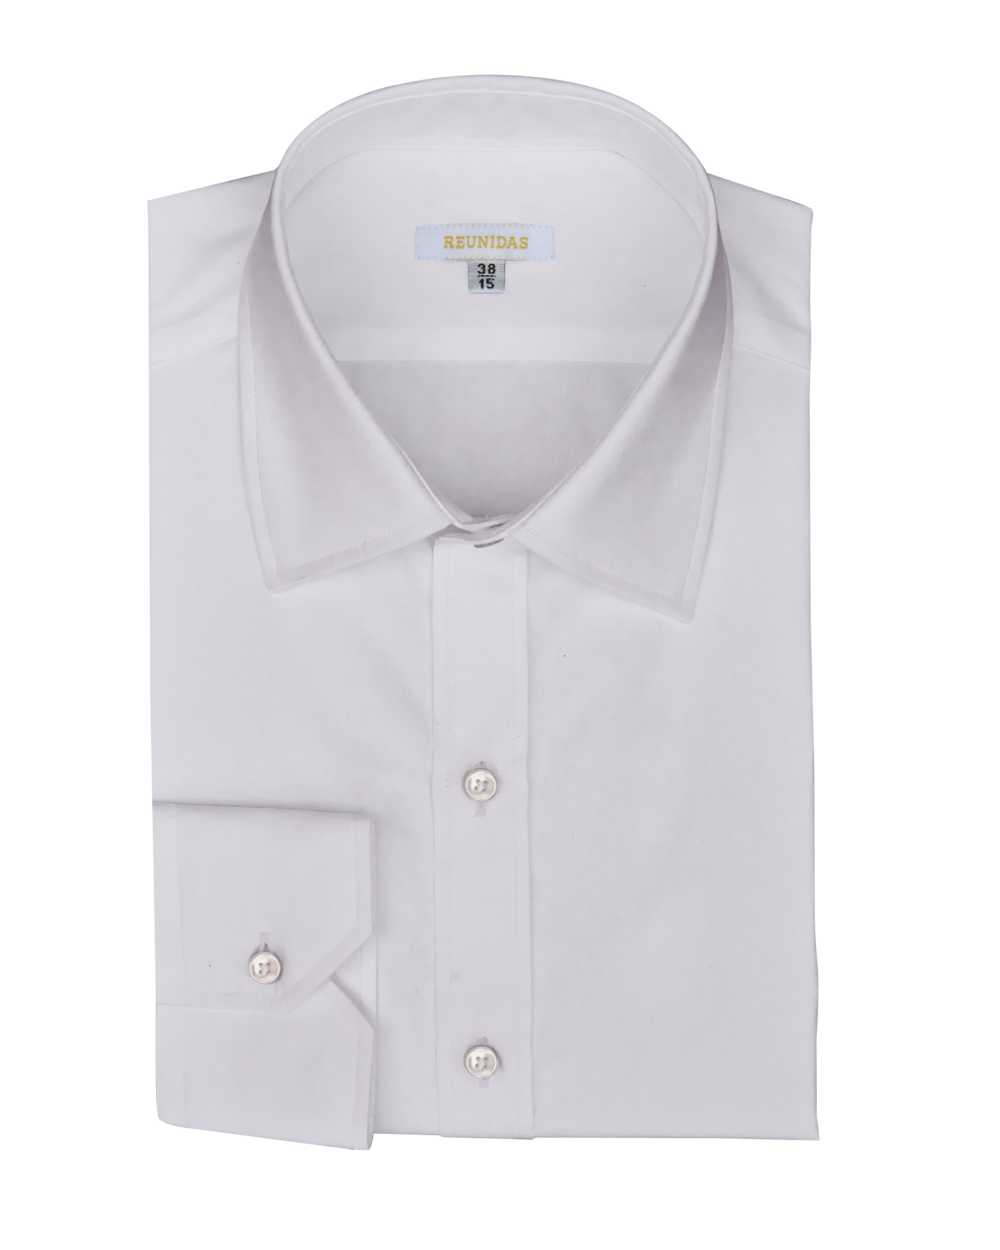 Branca shirt